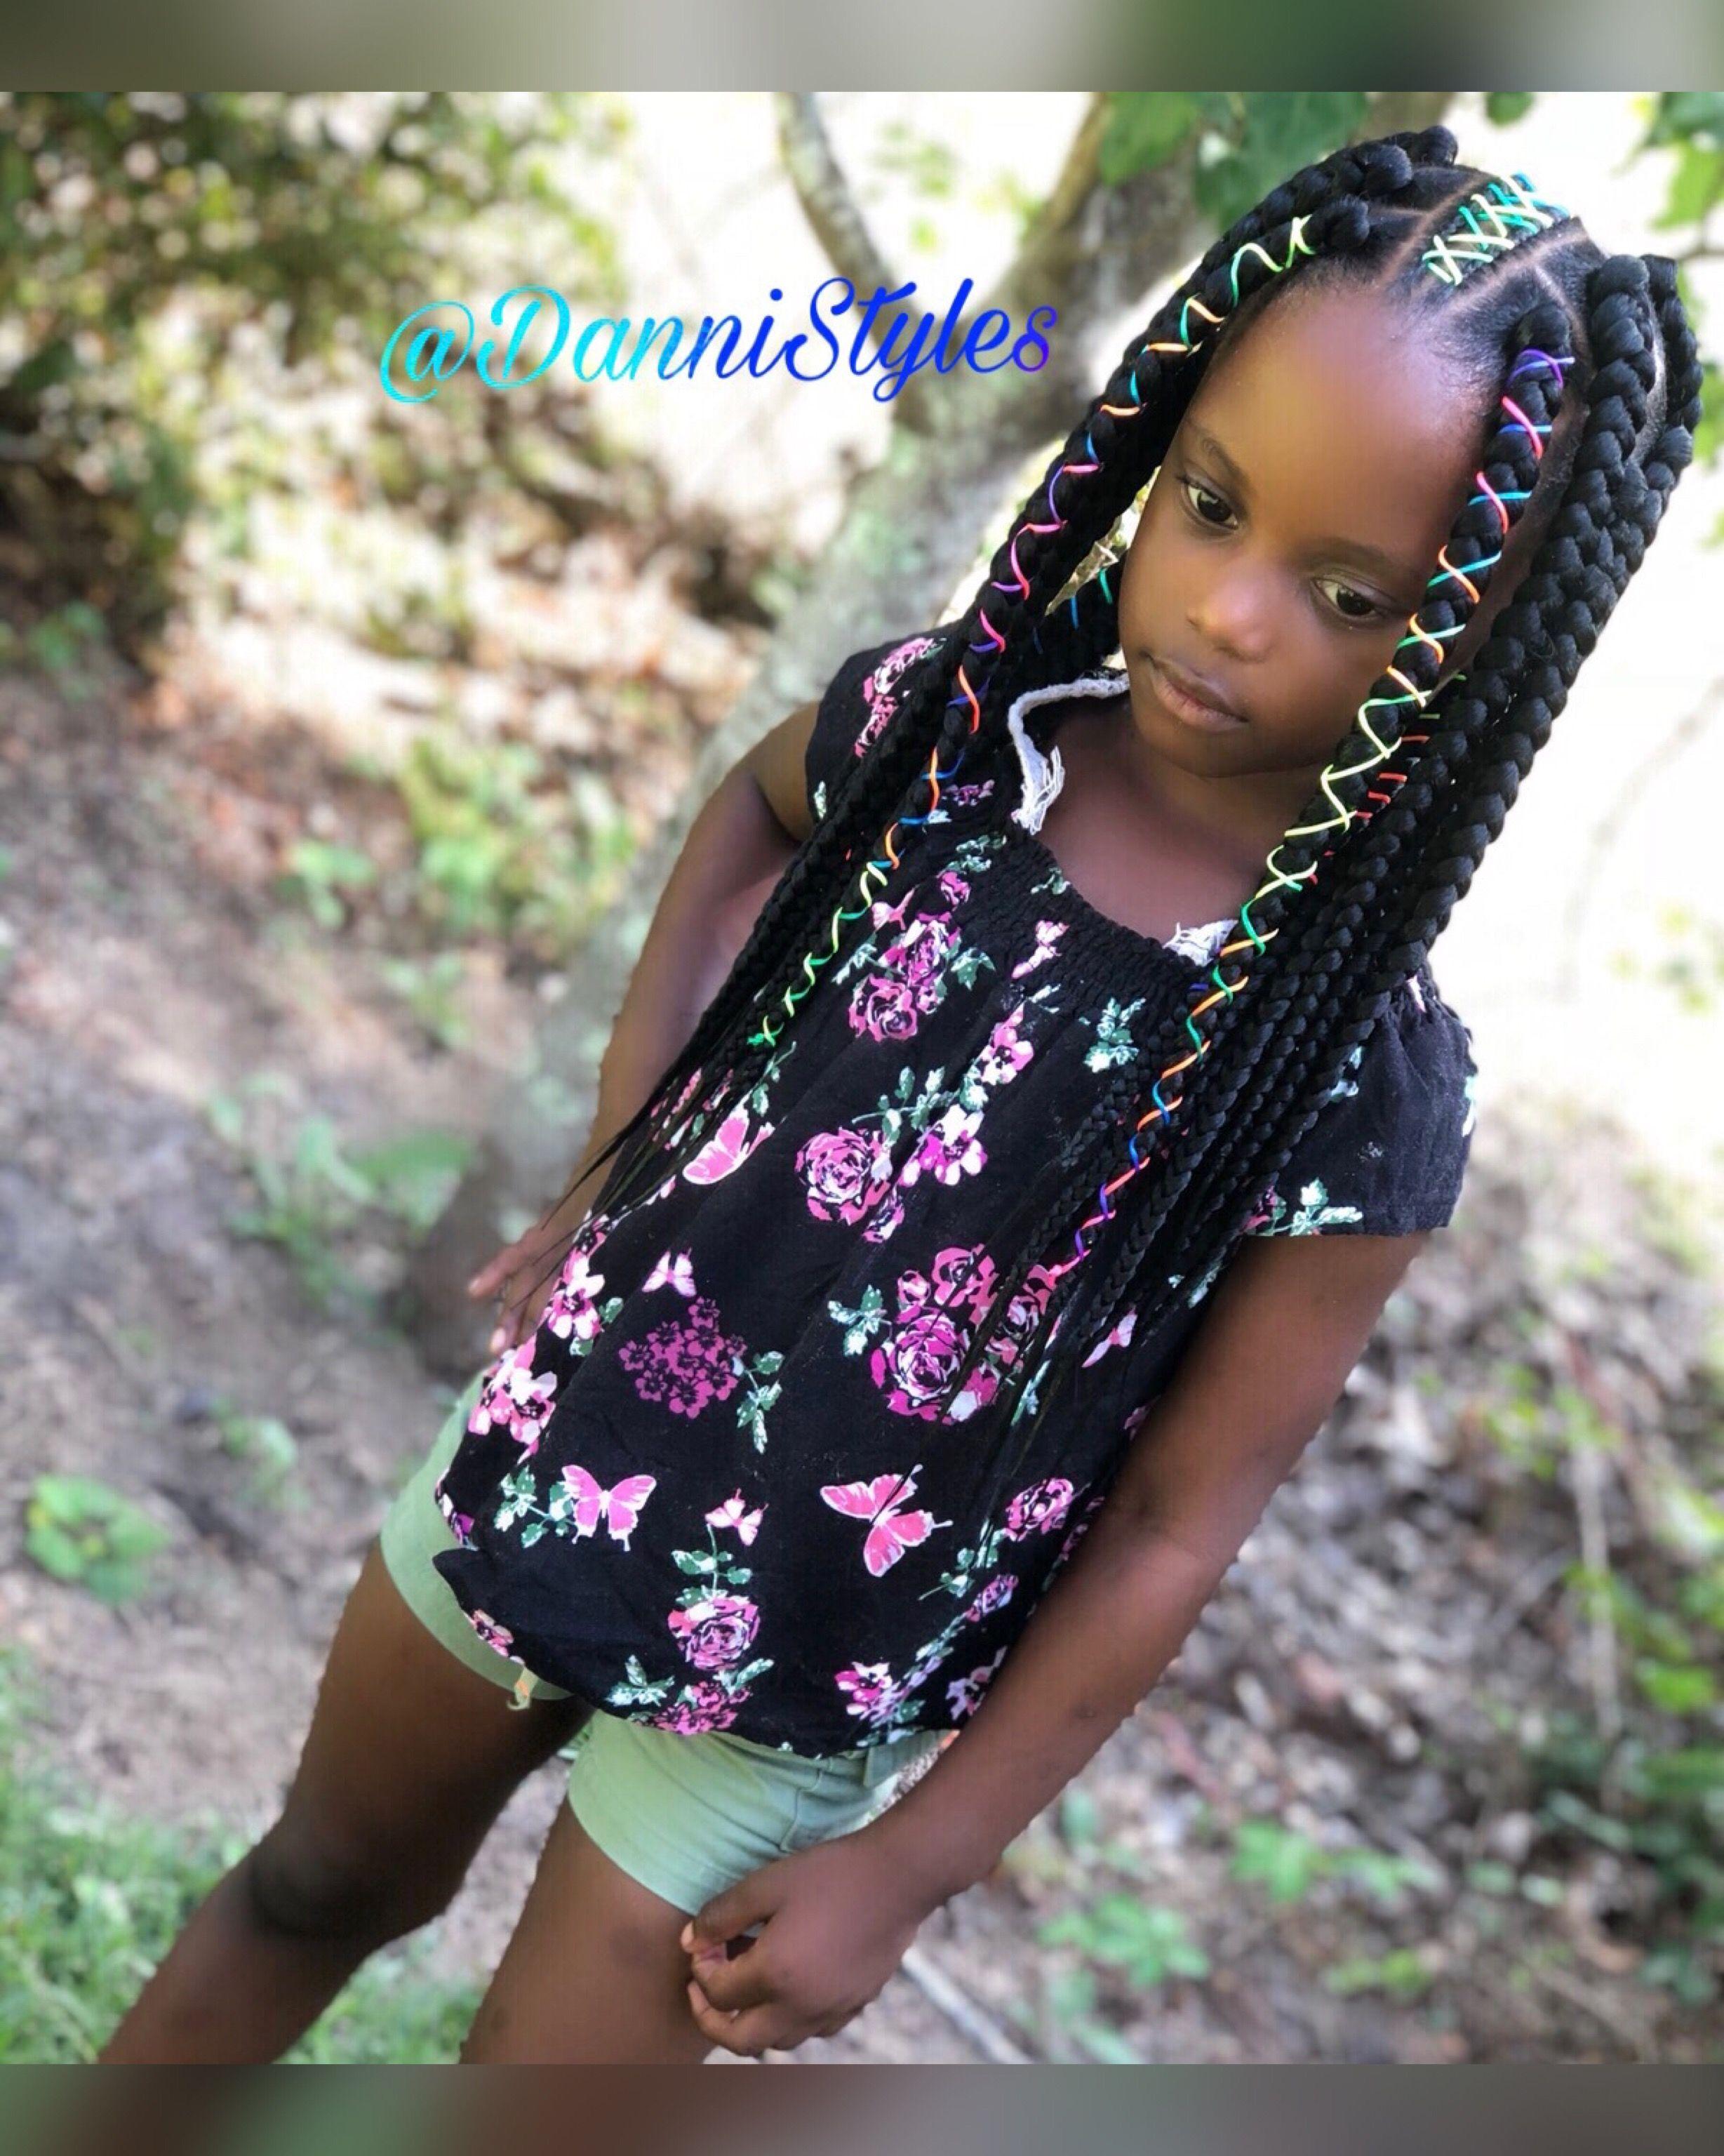 Dannistyles Image By Danni Chelley Kid Braid Styles Kids Box